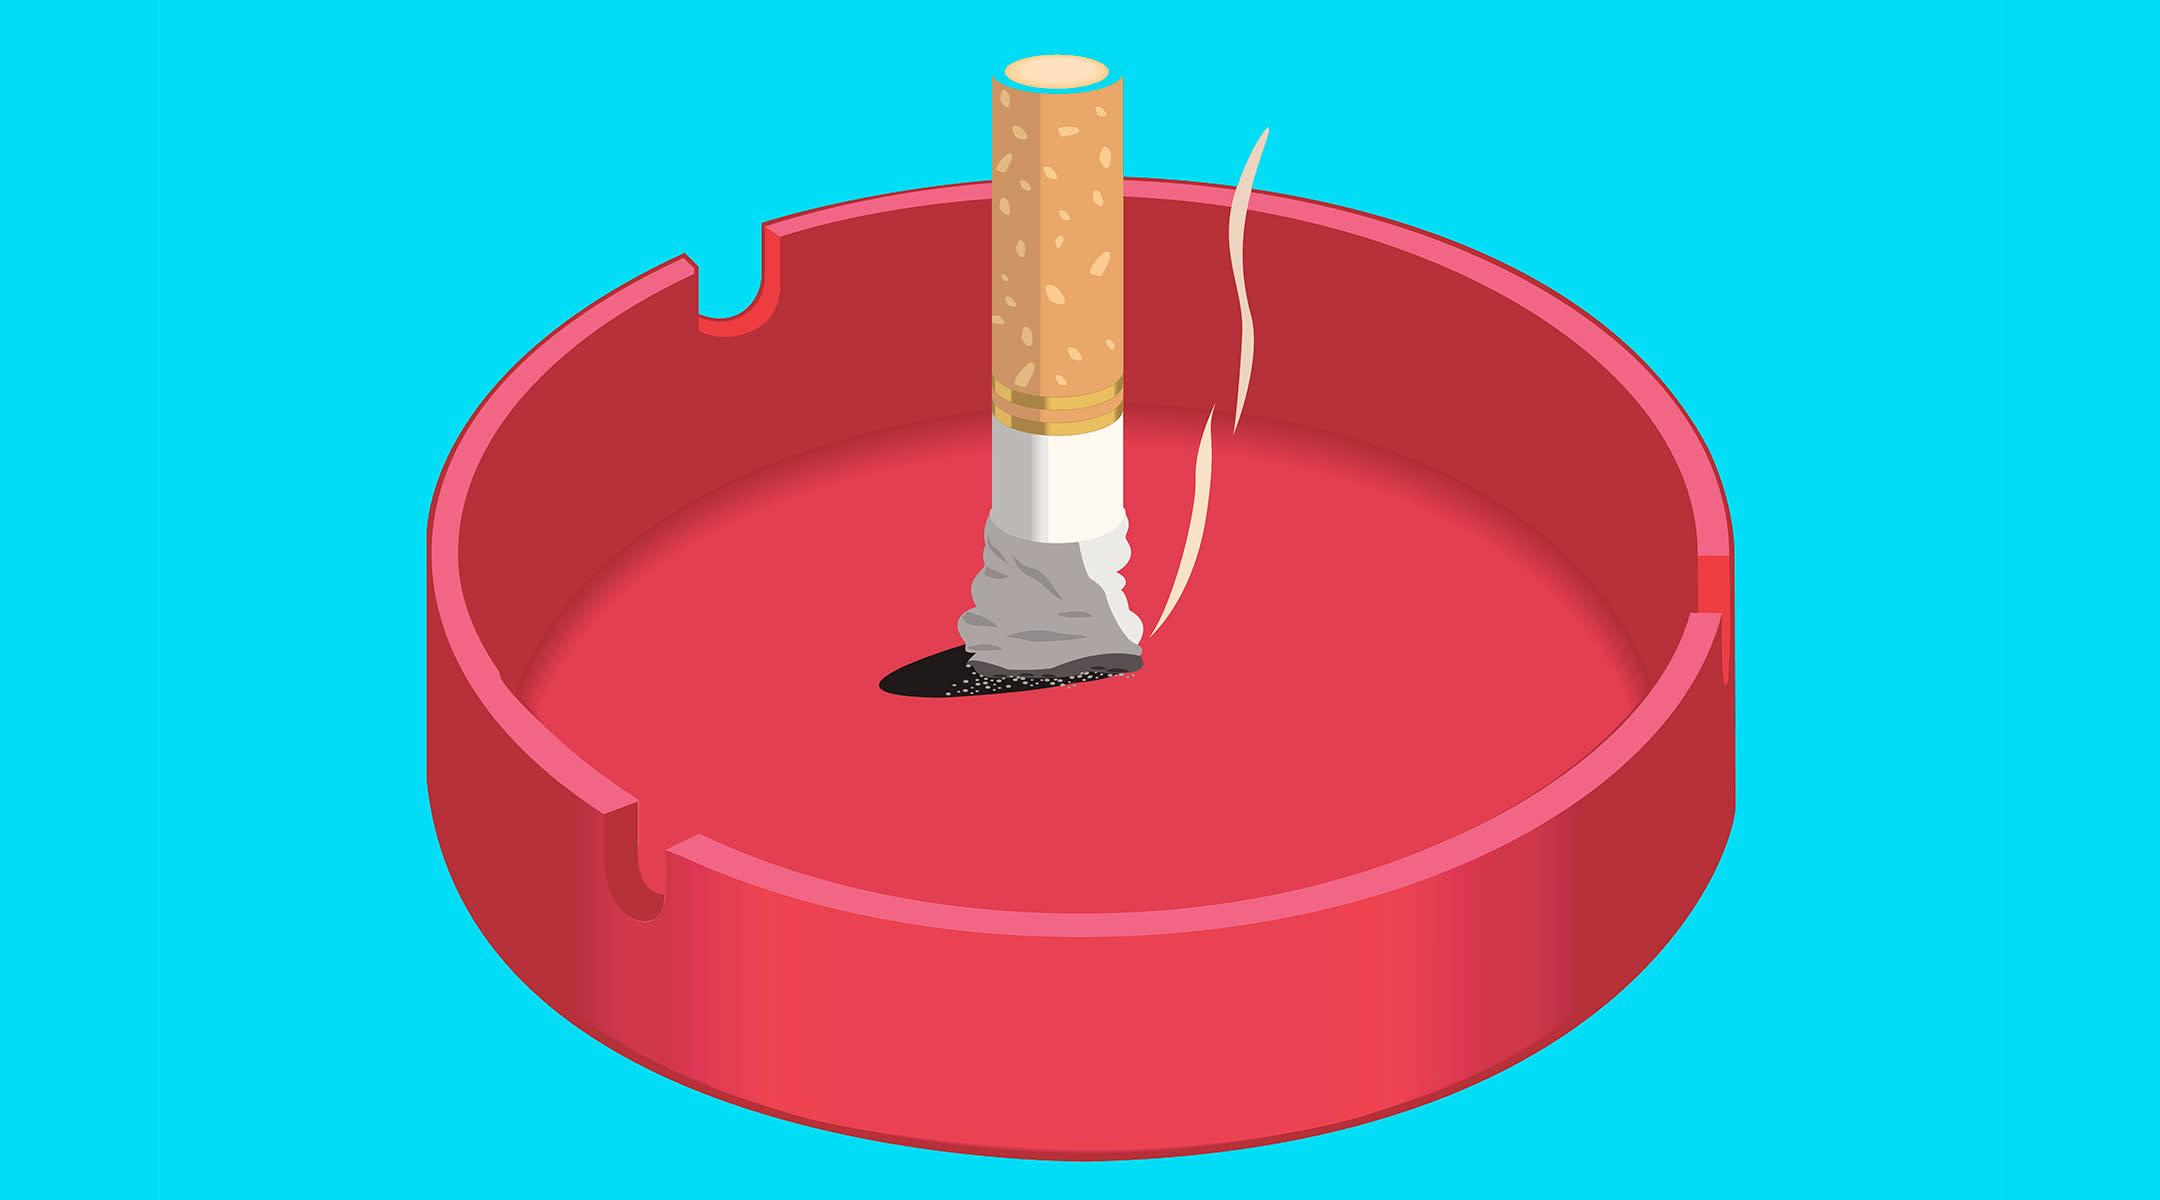 cigarette put out ash tray